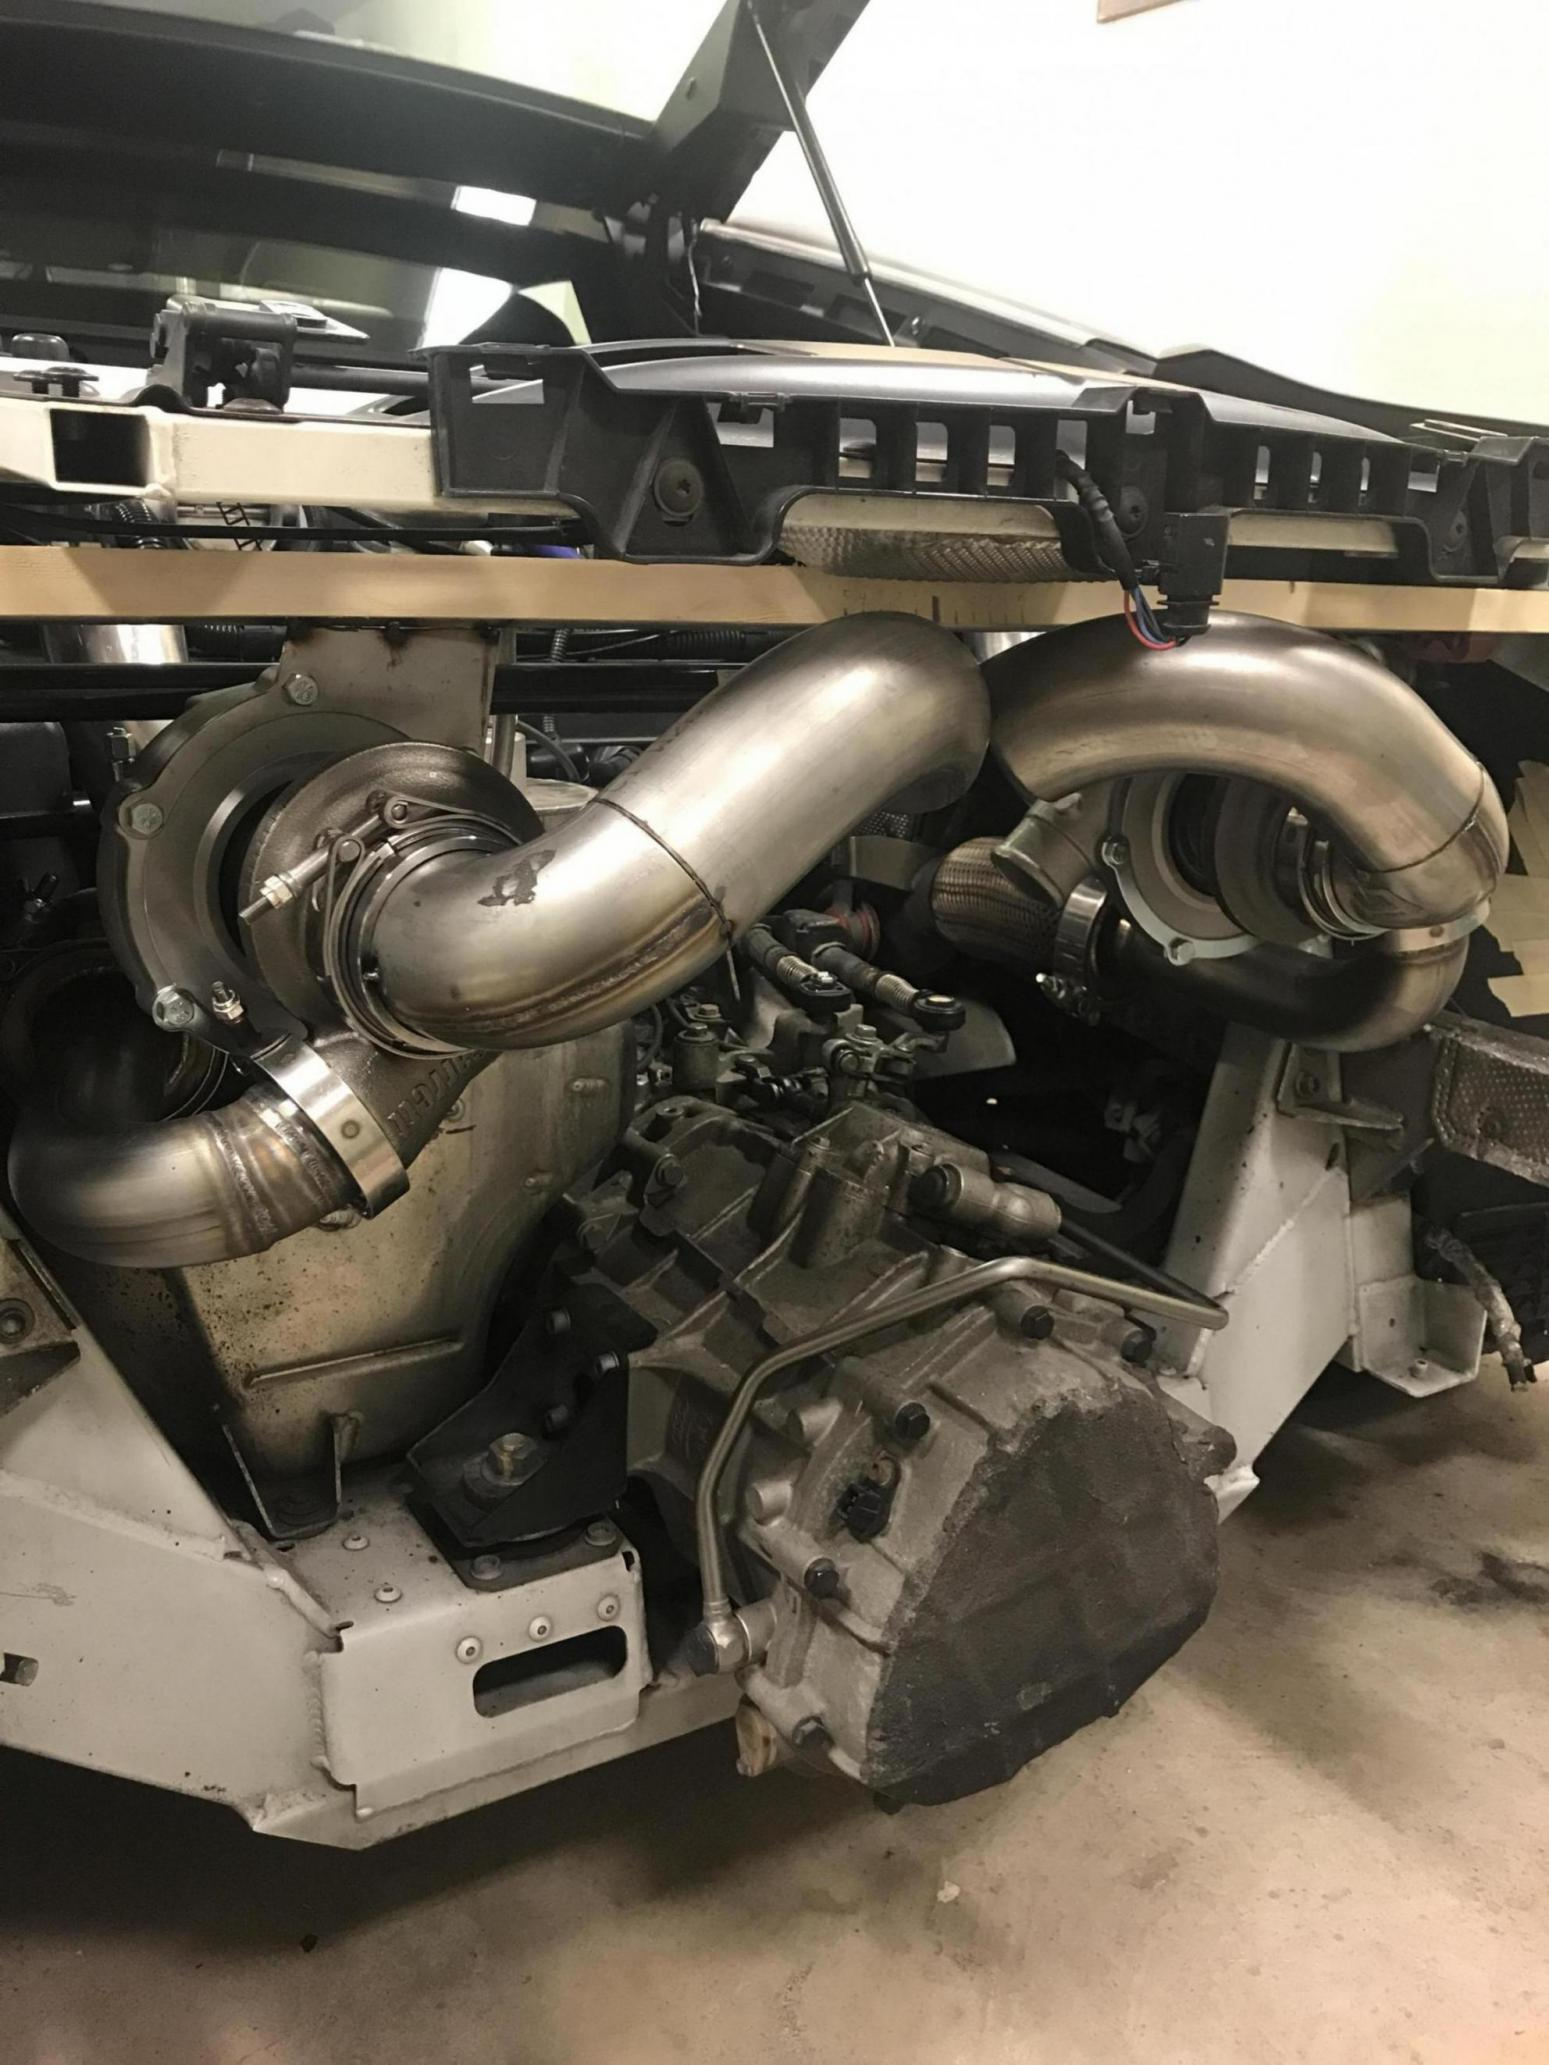 R8 v8 turbo project-img_5106_1540400761636.jpg